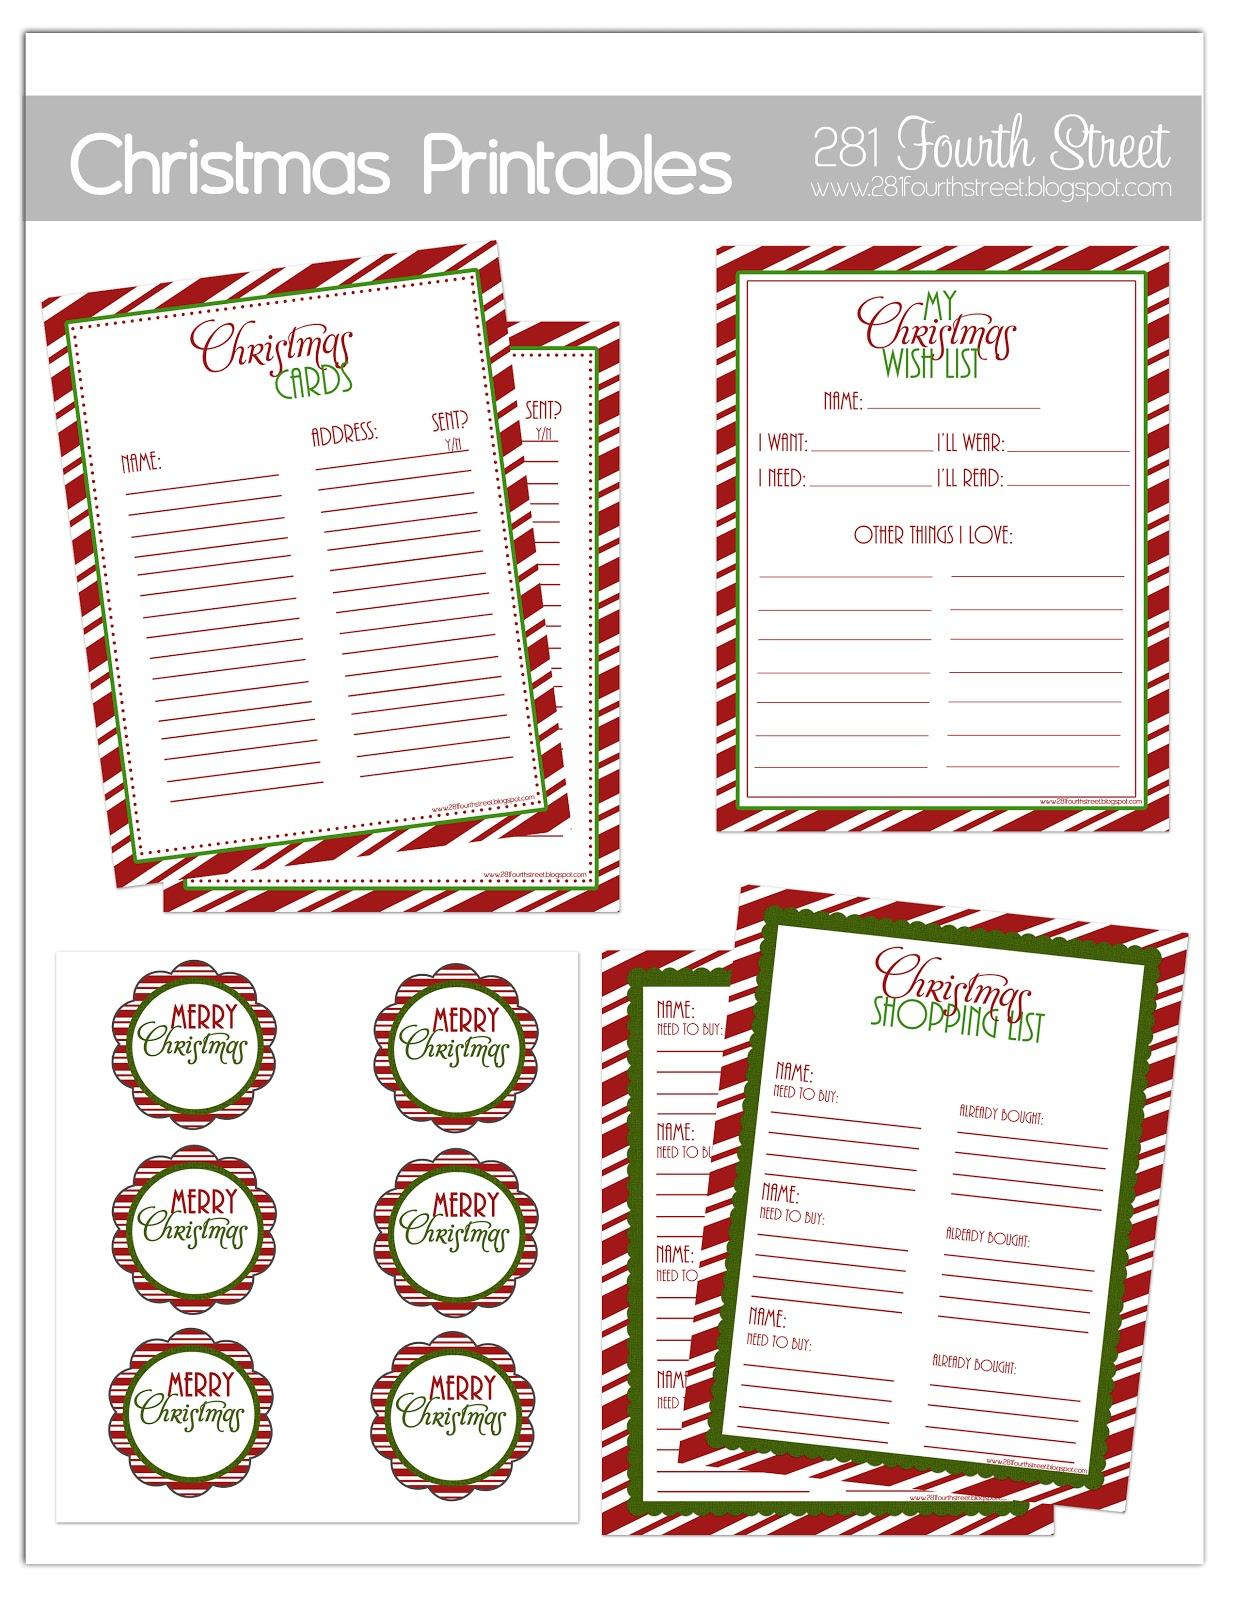 281 Designs Christmas Organization Printables